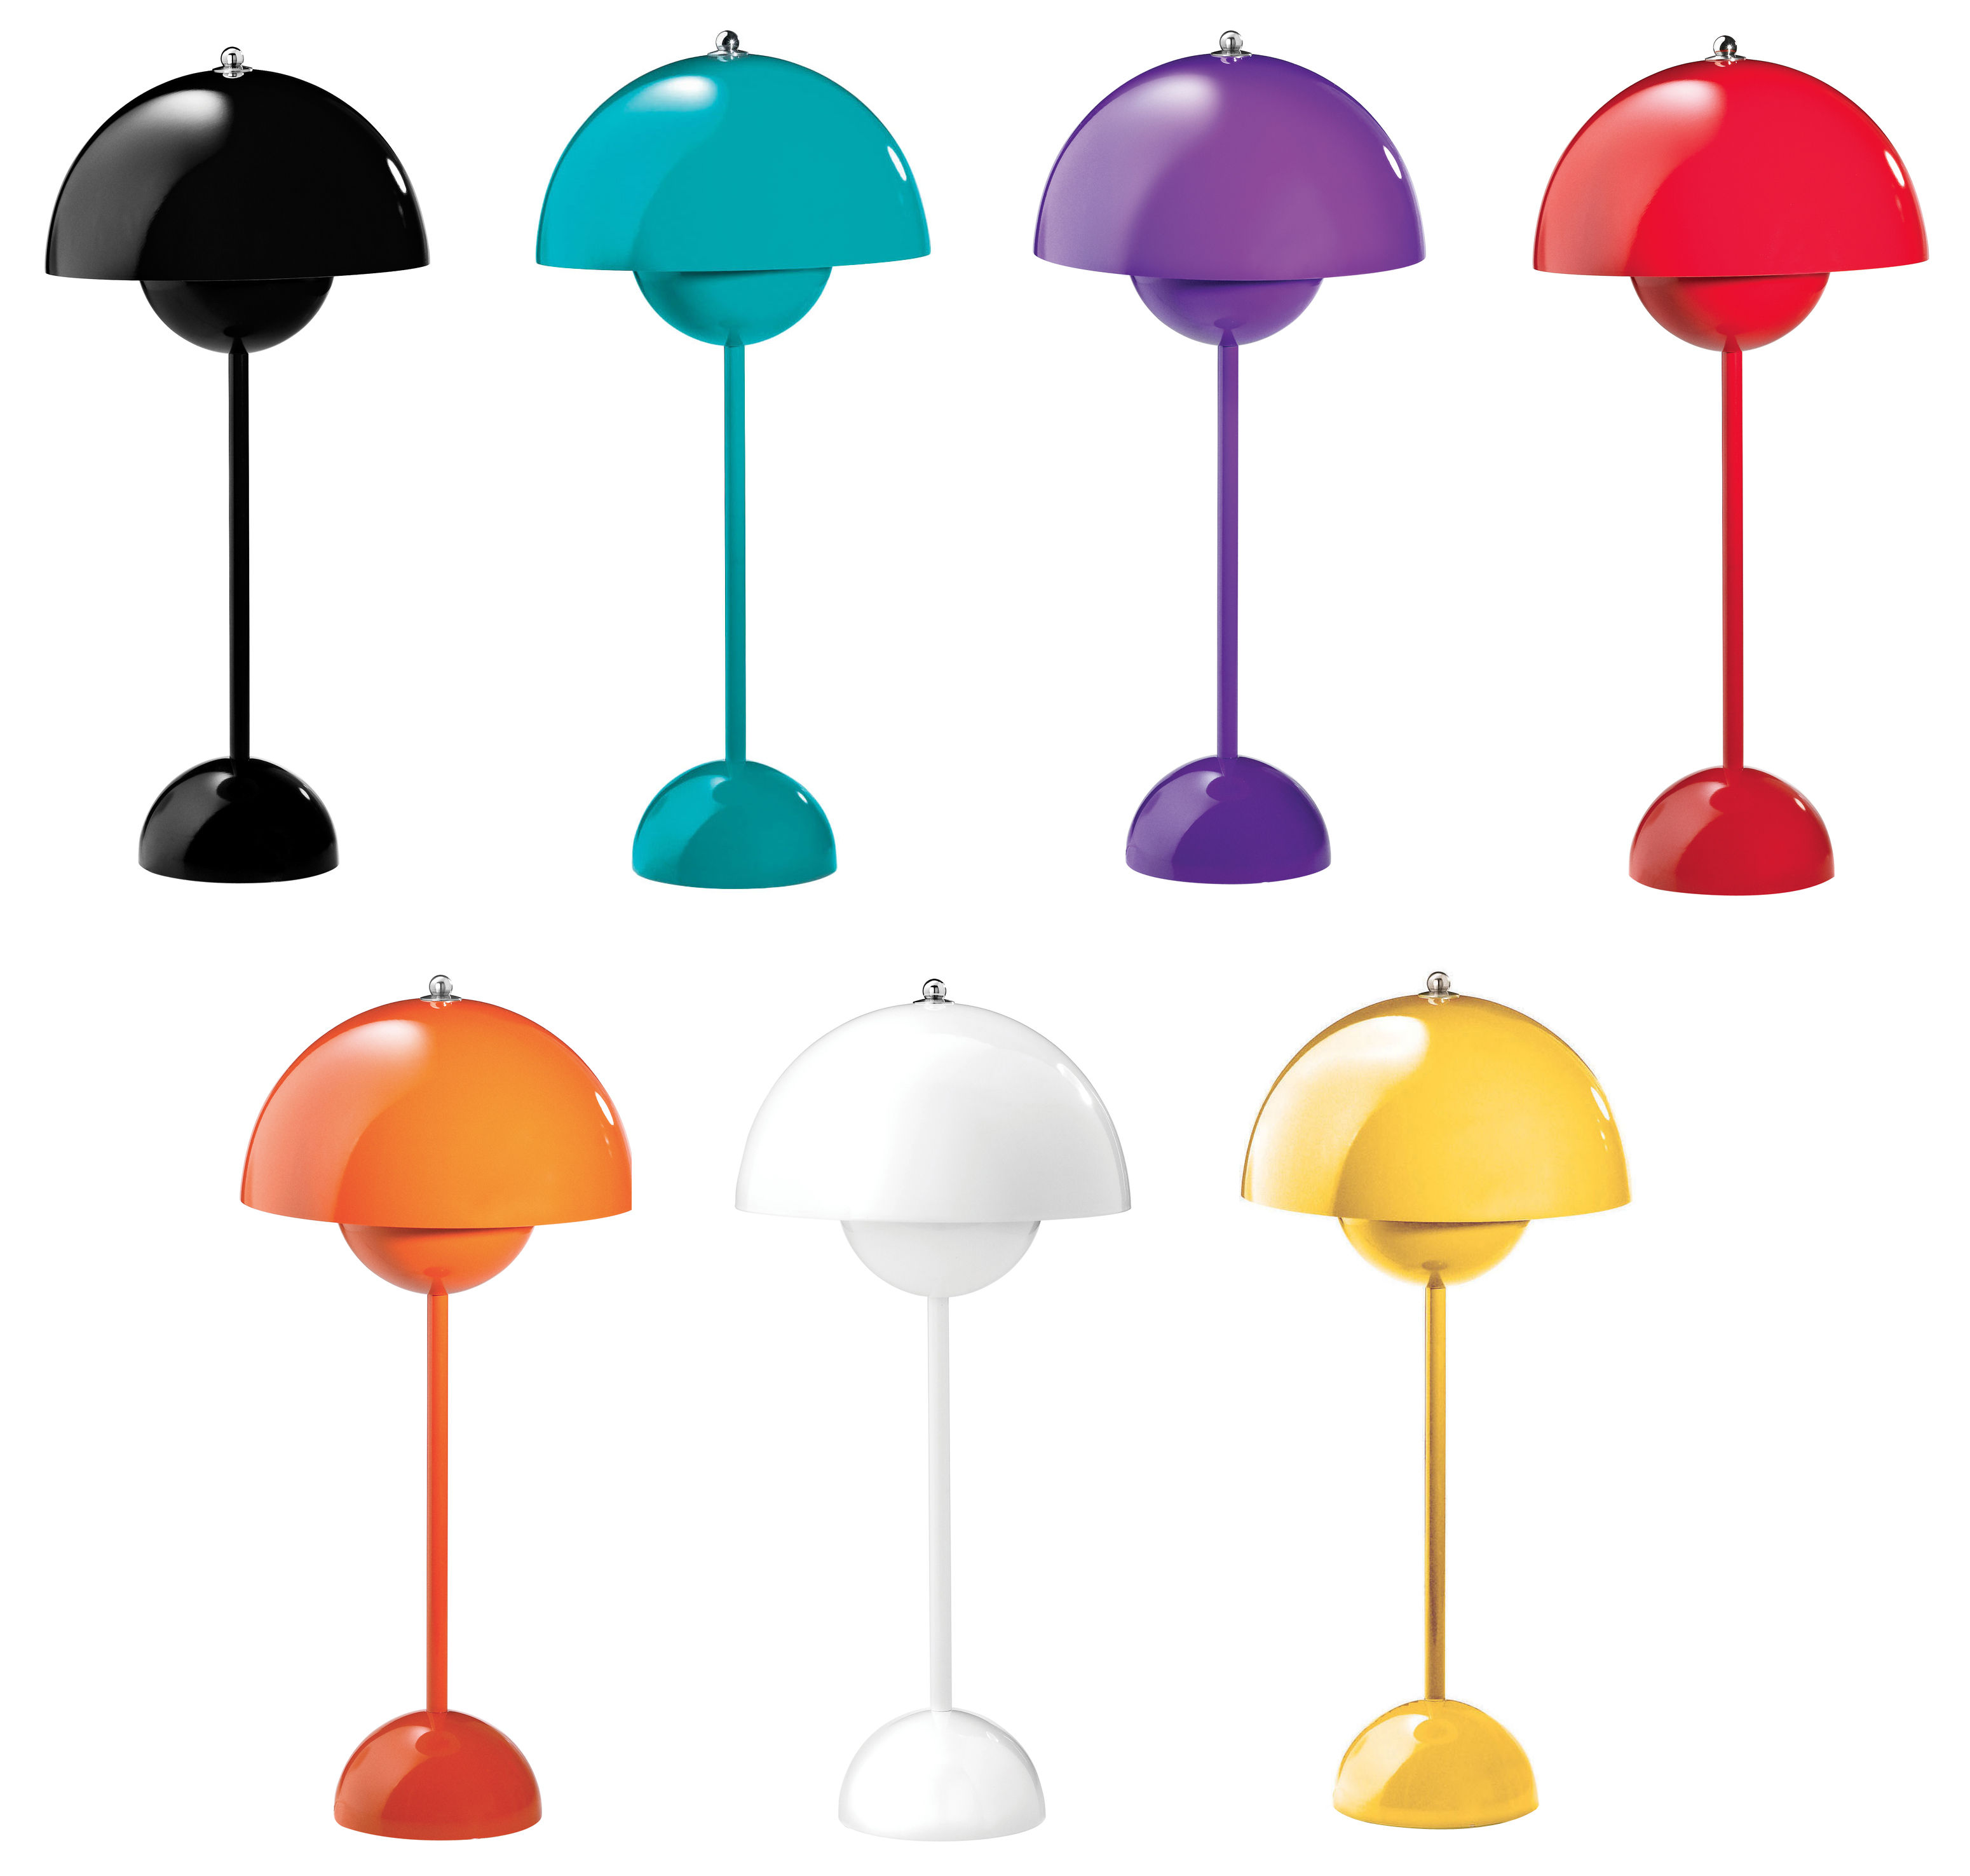 Hauptdesign Flowerpot Lampe Vp3 Full Version Hd Quality Lampe Vp3 Sesselroy Villamediceaammiraglio It